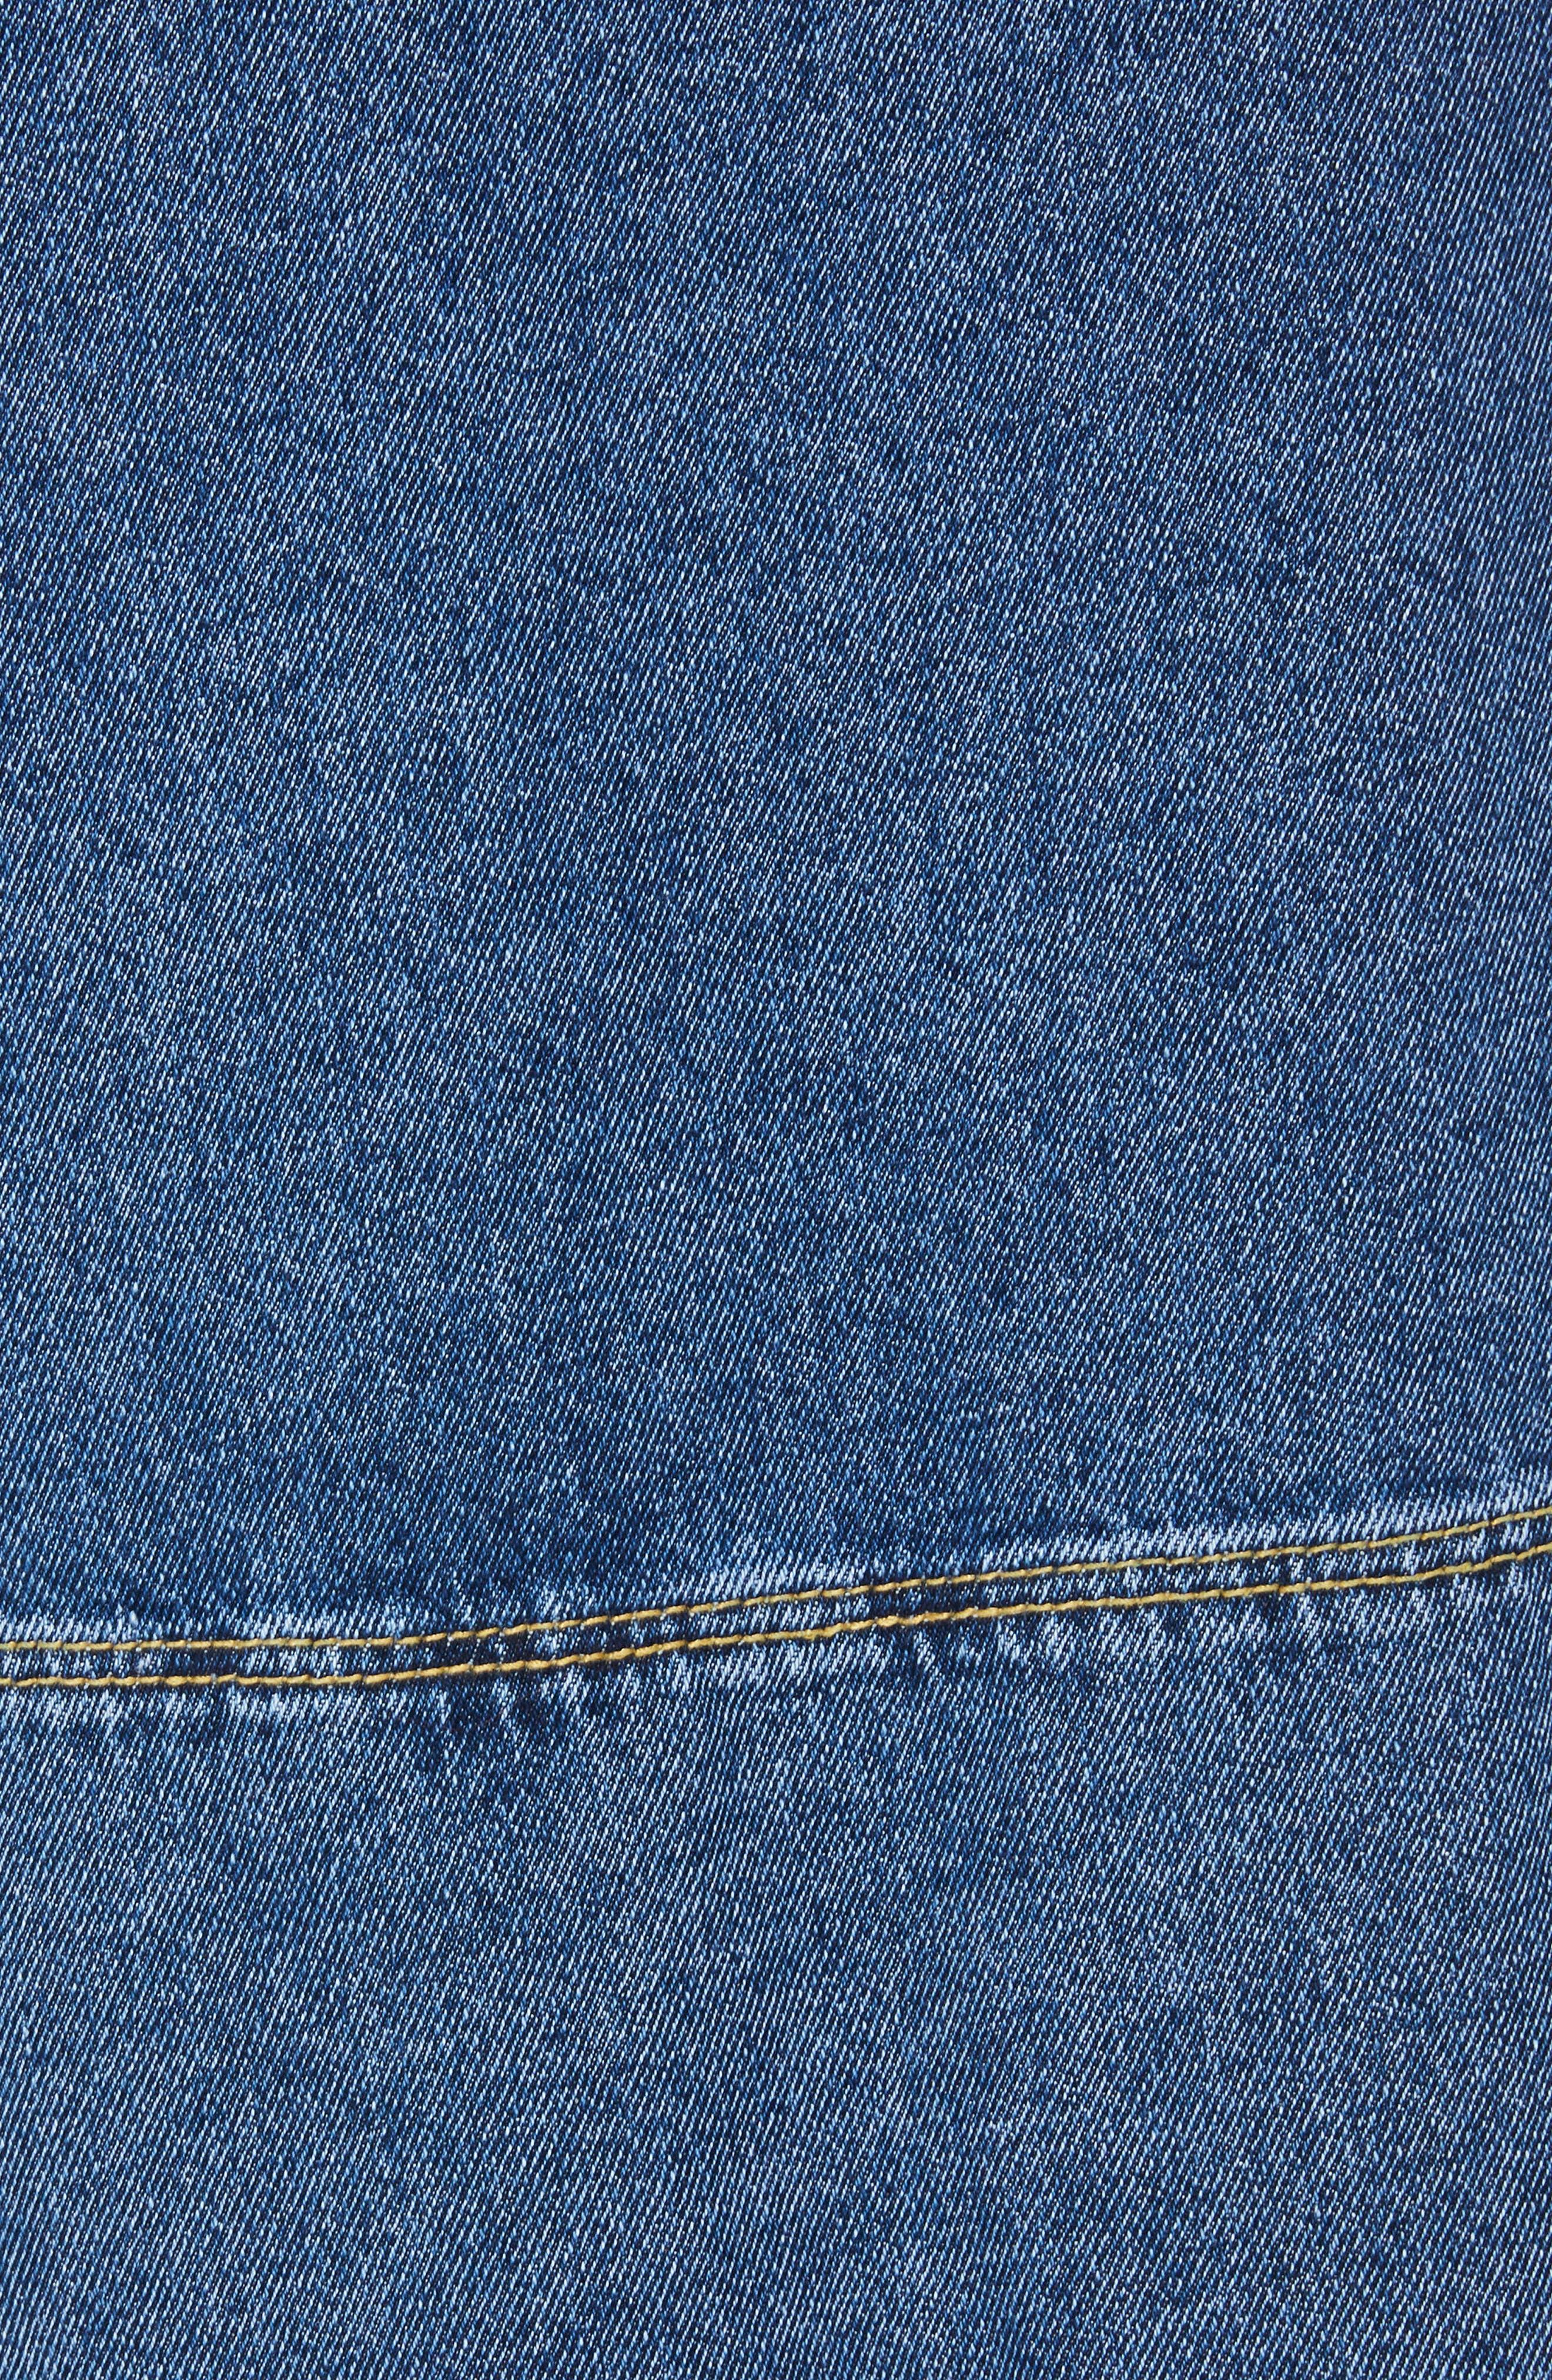 Denim Pinafore Wrap Dress,                             Alternate thumbnail 3, color,                             Blue